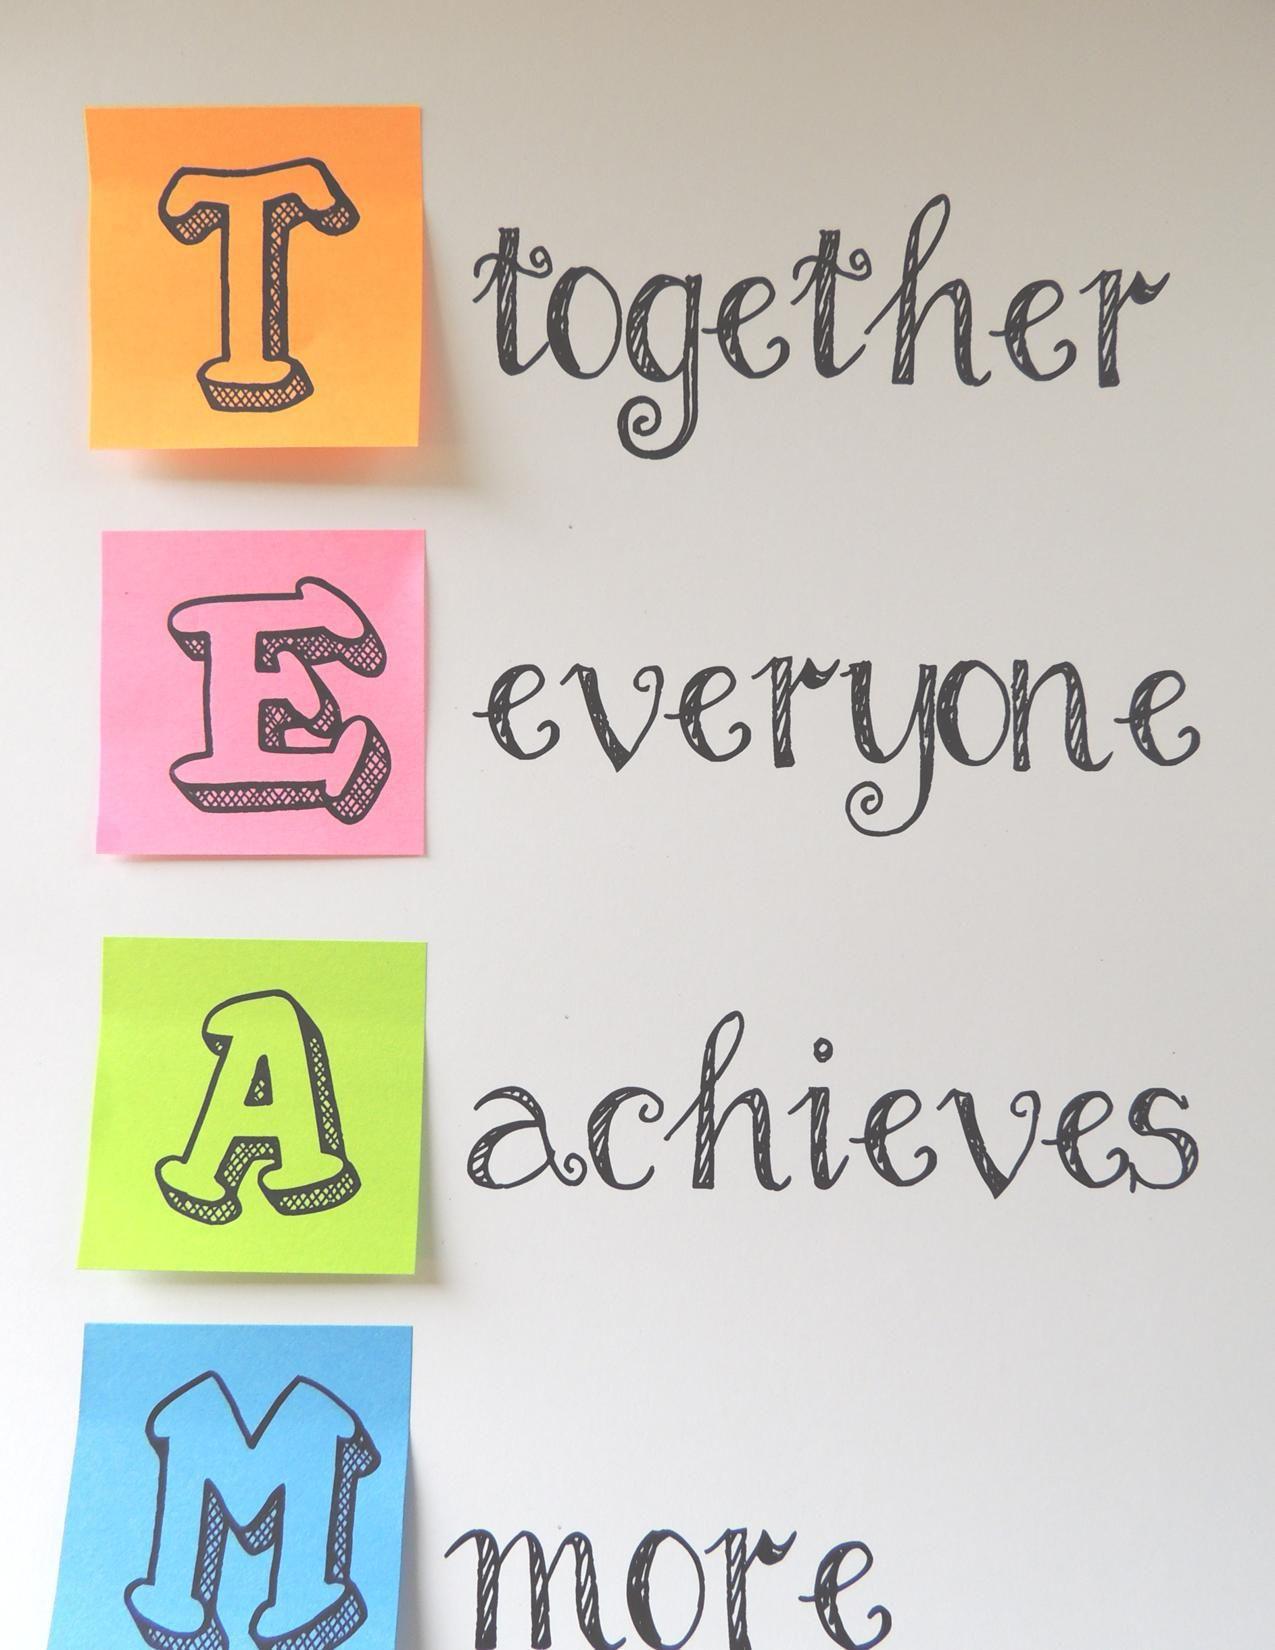 42 INSPIRATIONAL TEAMWORK QUOTES Teamwork quotes, Best